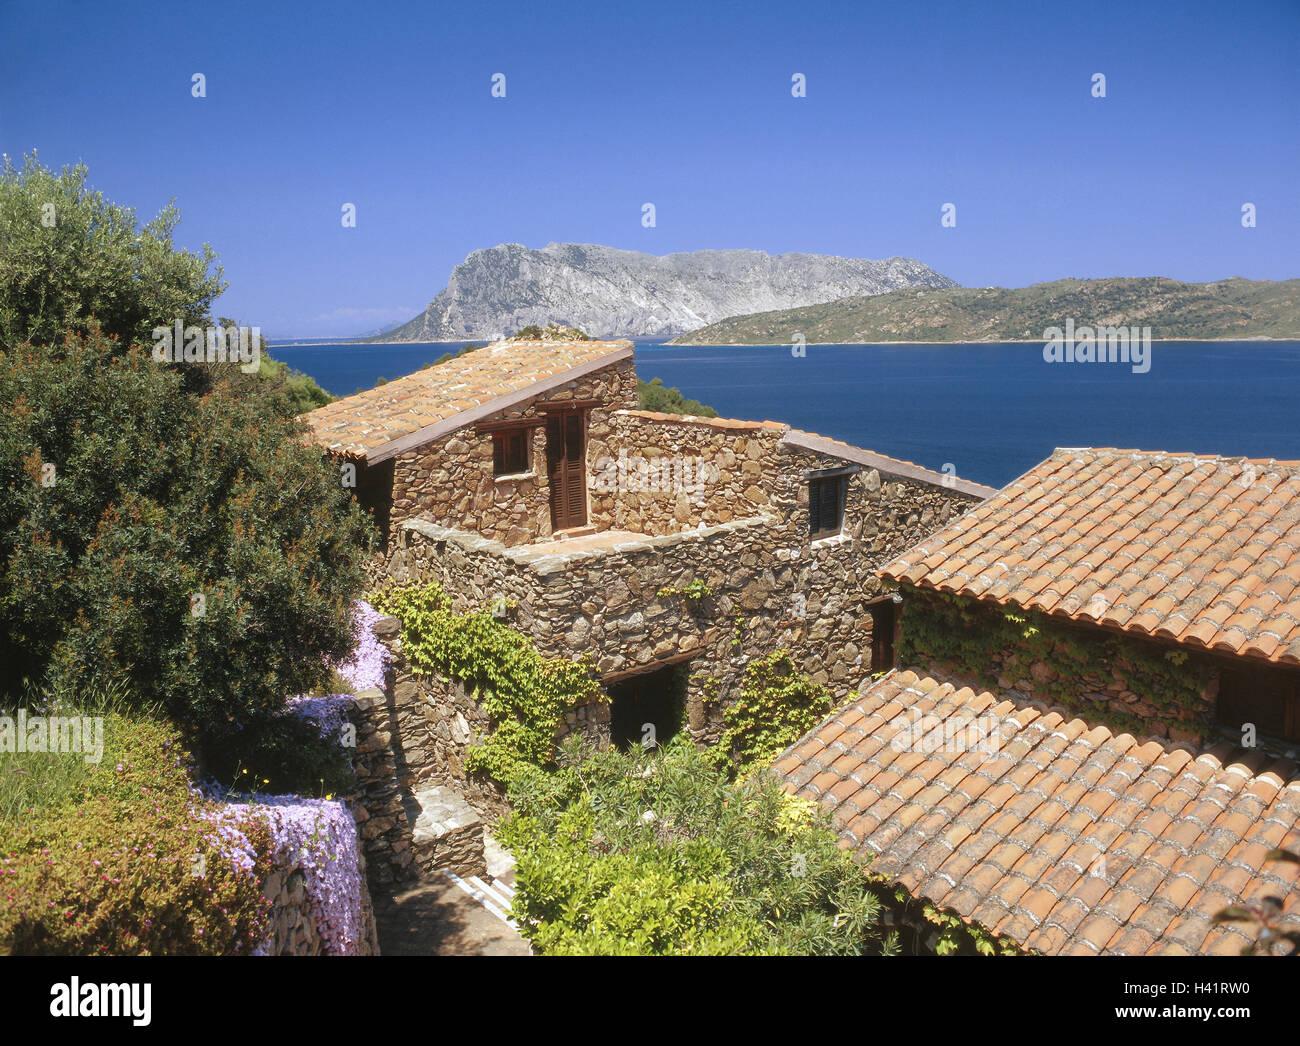 Case Di Pietra Sardegna : Villas and holiday homes in sardinia stile sardegna